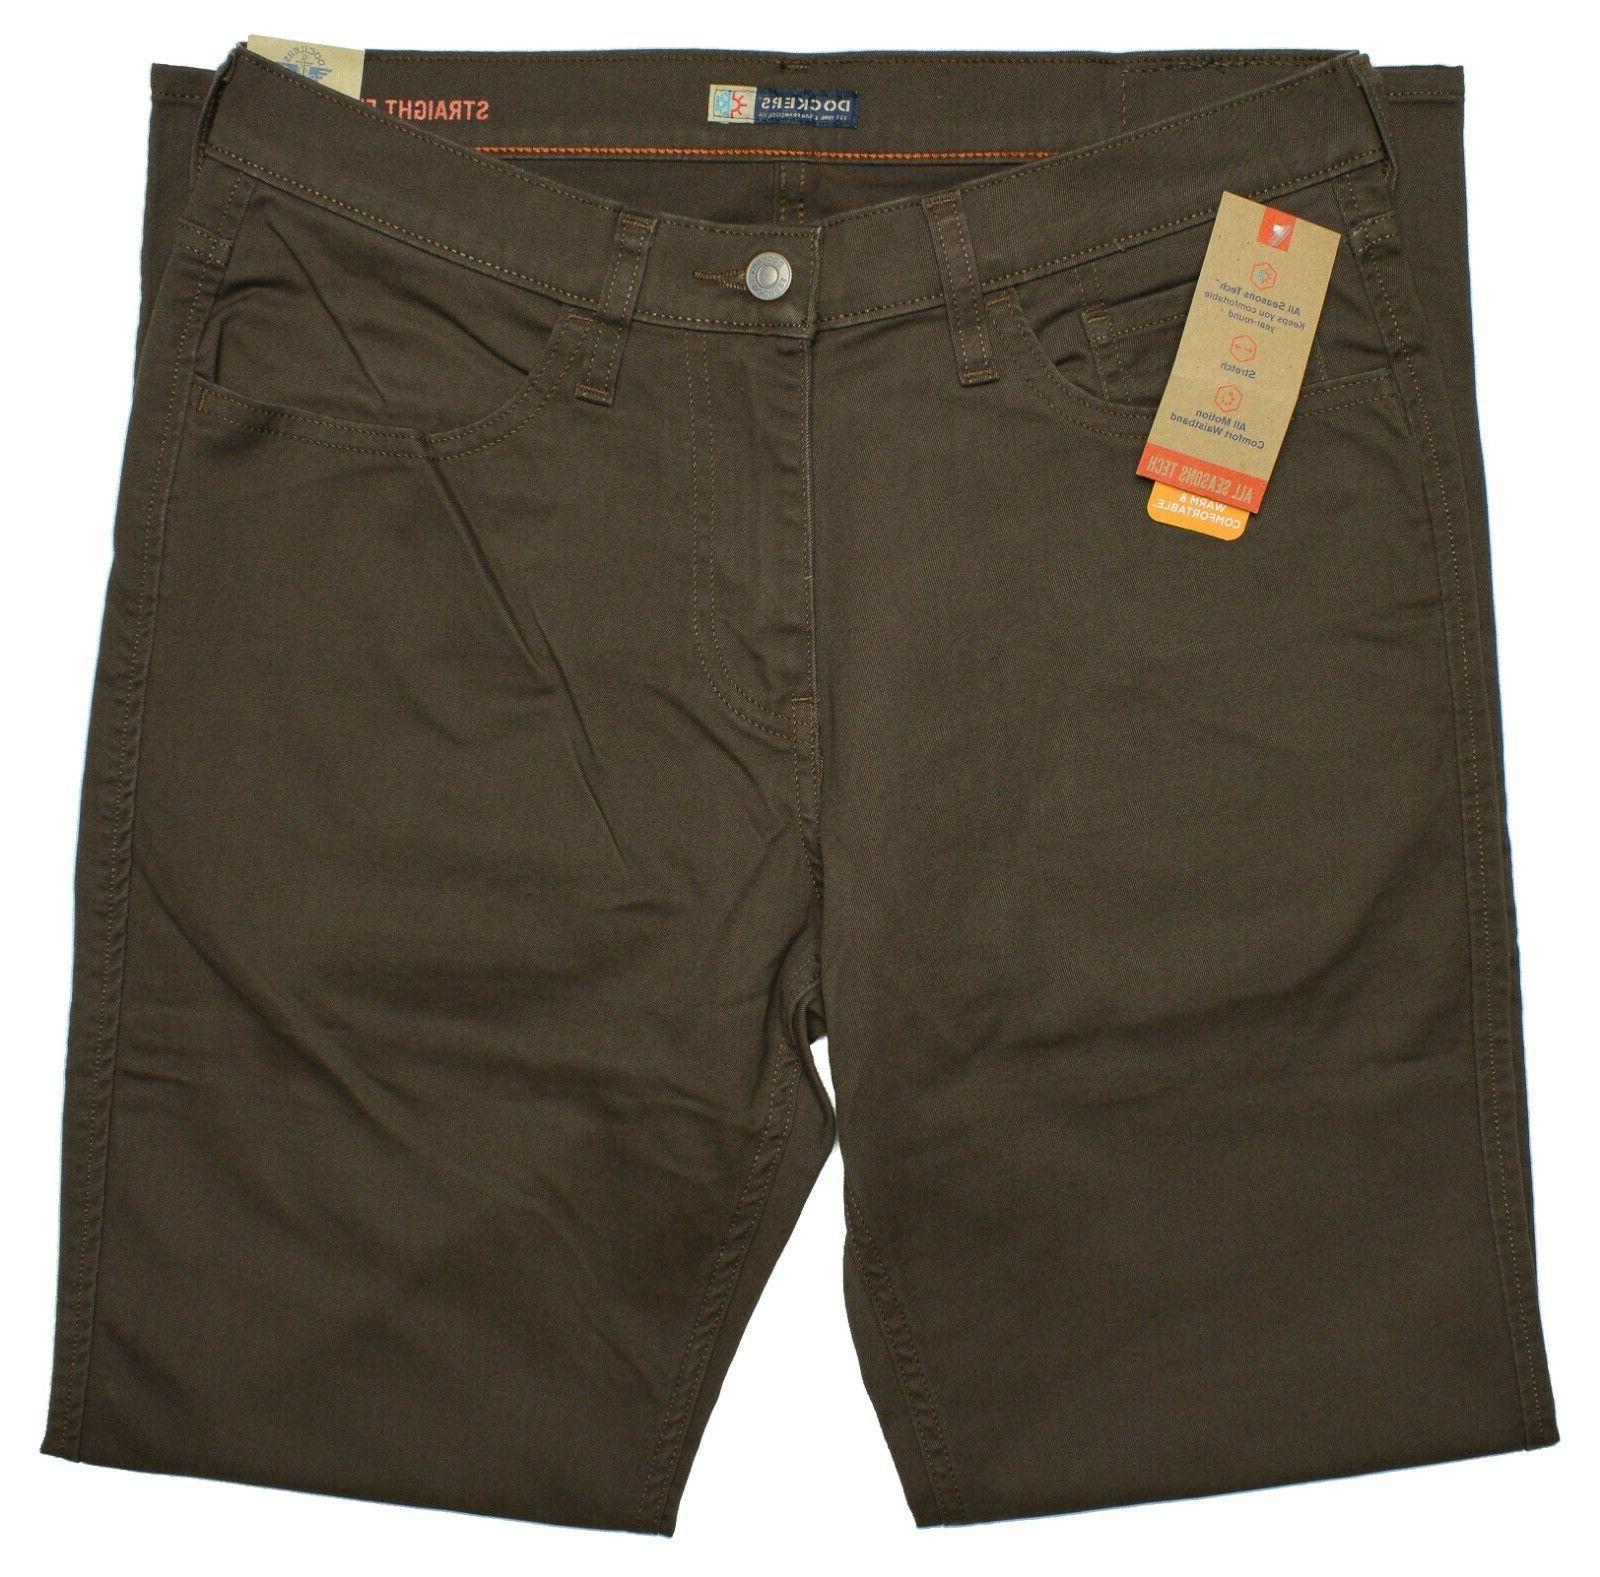 Straight All Tech Pants